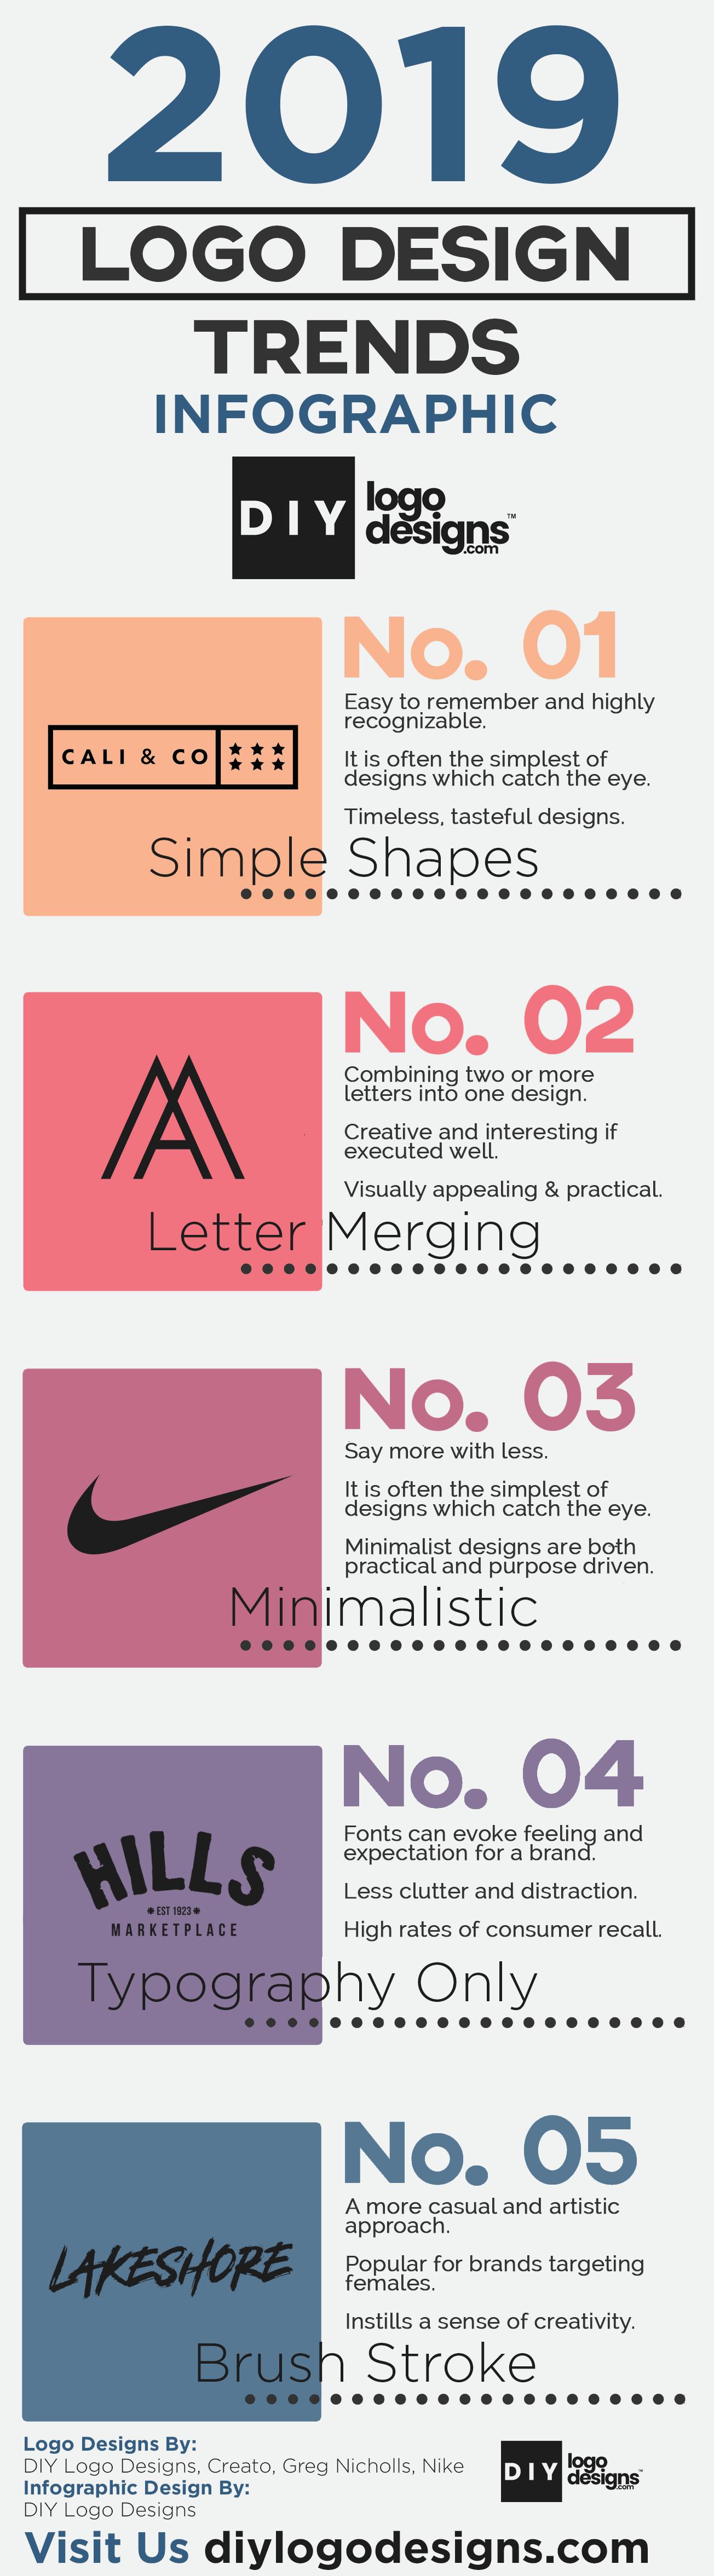 logo design infographic 2019 trends